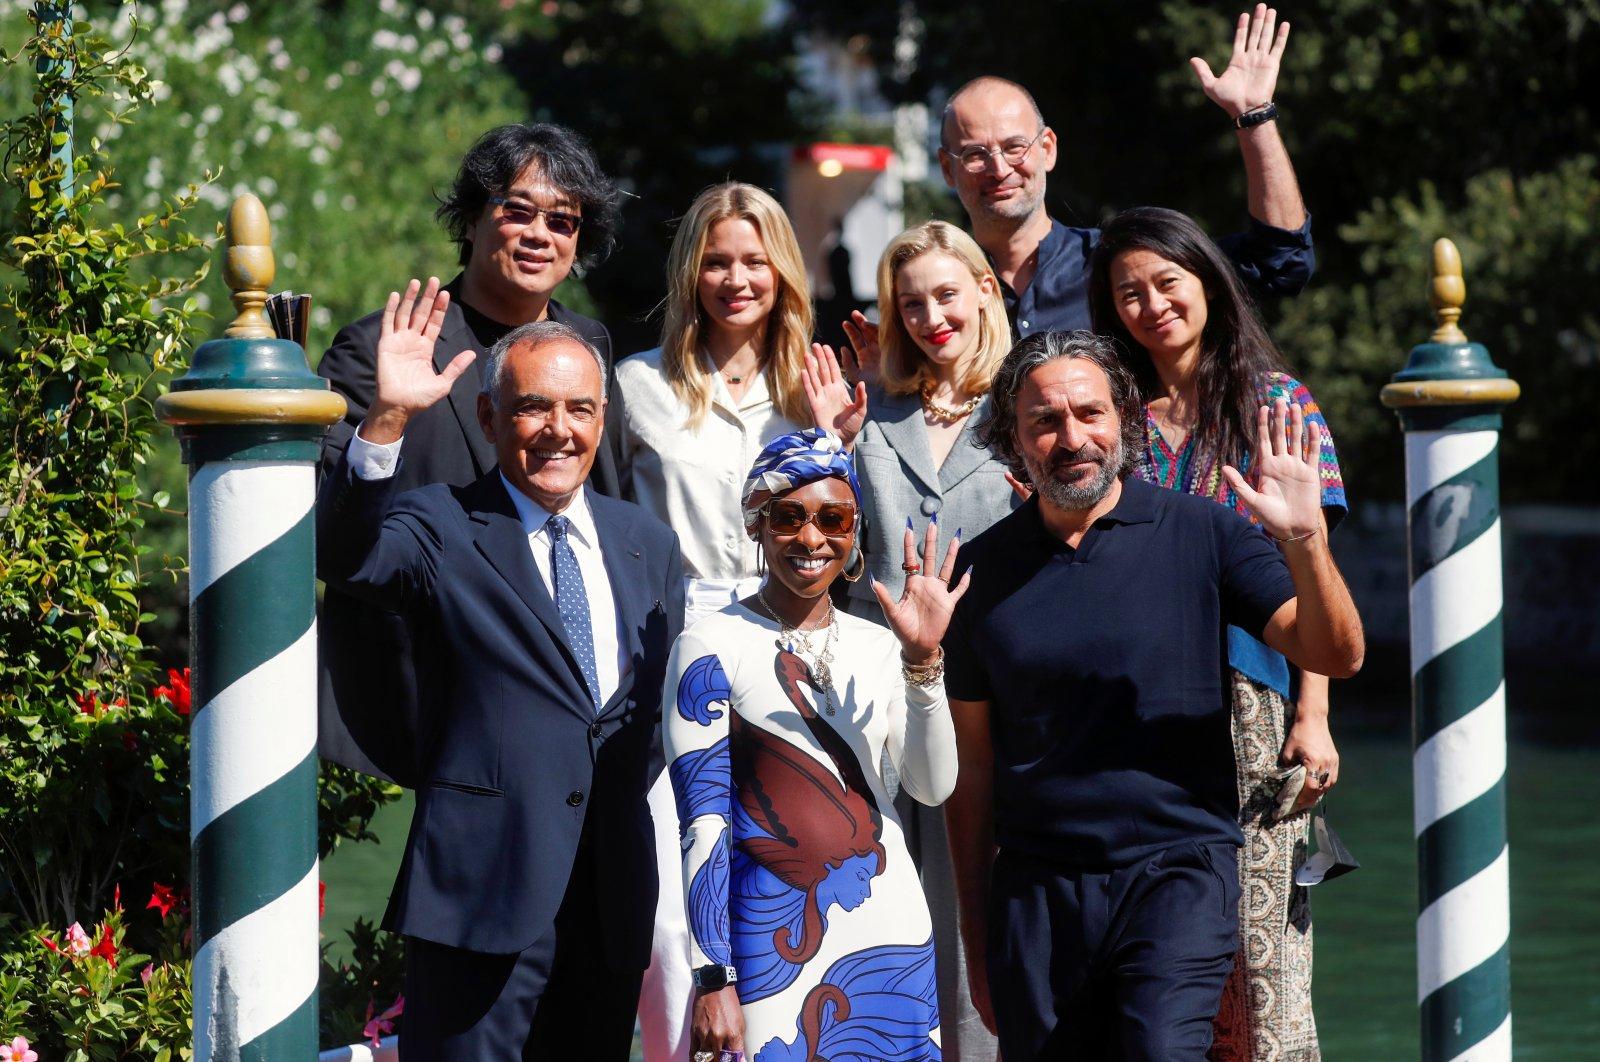 Members of the Venice Film Festival Jury, Bong Joon-ho, Saverio Costanzo, Virginie Efira, Cynthia Erivo, Sarah Gadon, Alexander Nanau, Chloe Zhao and Alberto Barbera pose for a photo, in Venice, Italy, Sept. 1, 2021. (Reuters Photo)